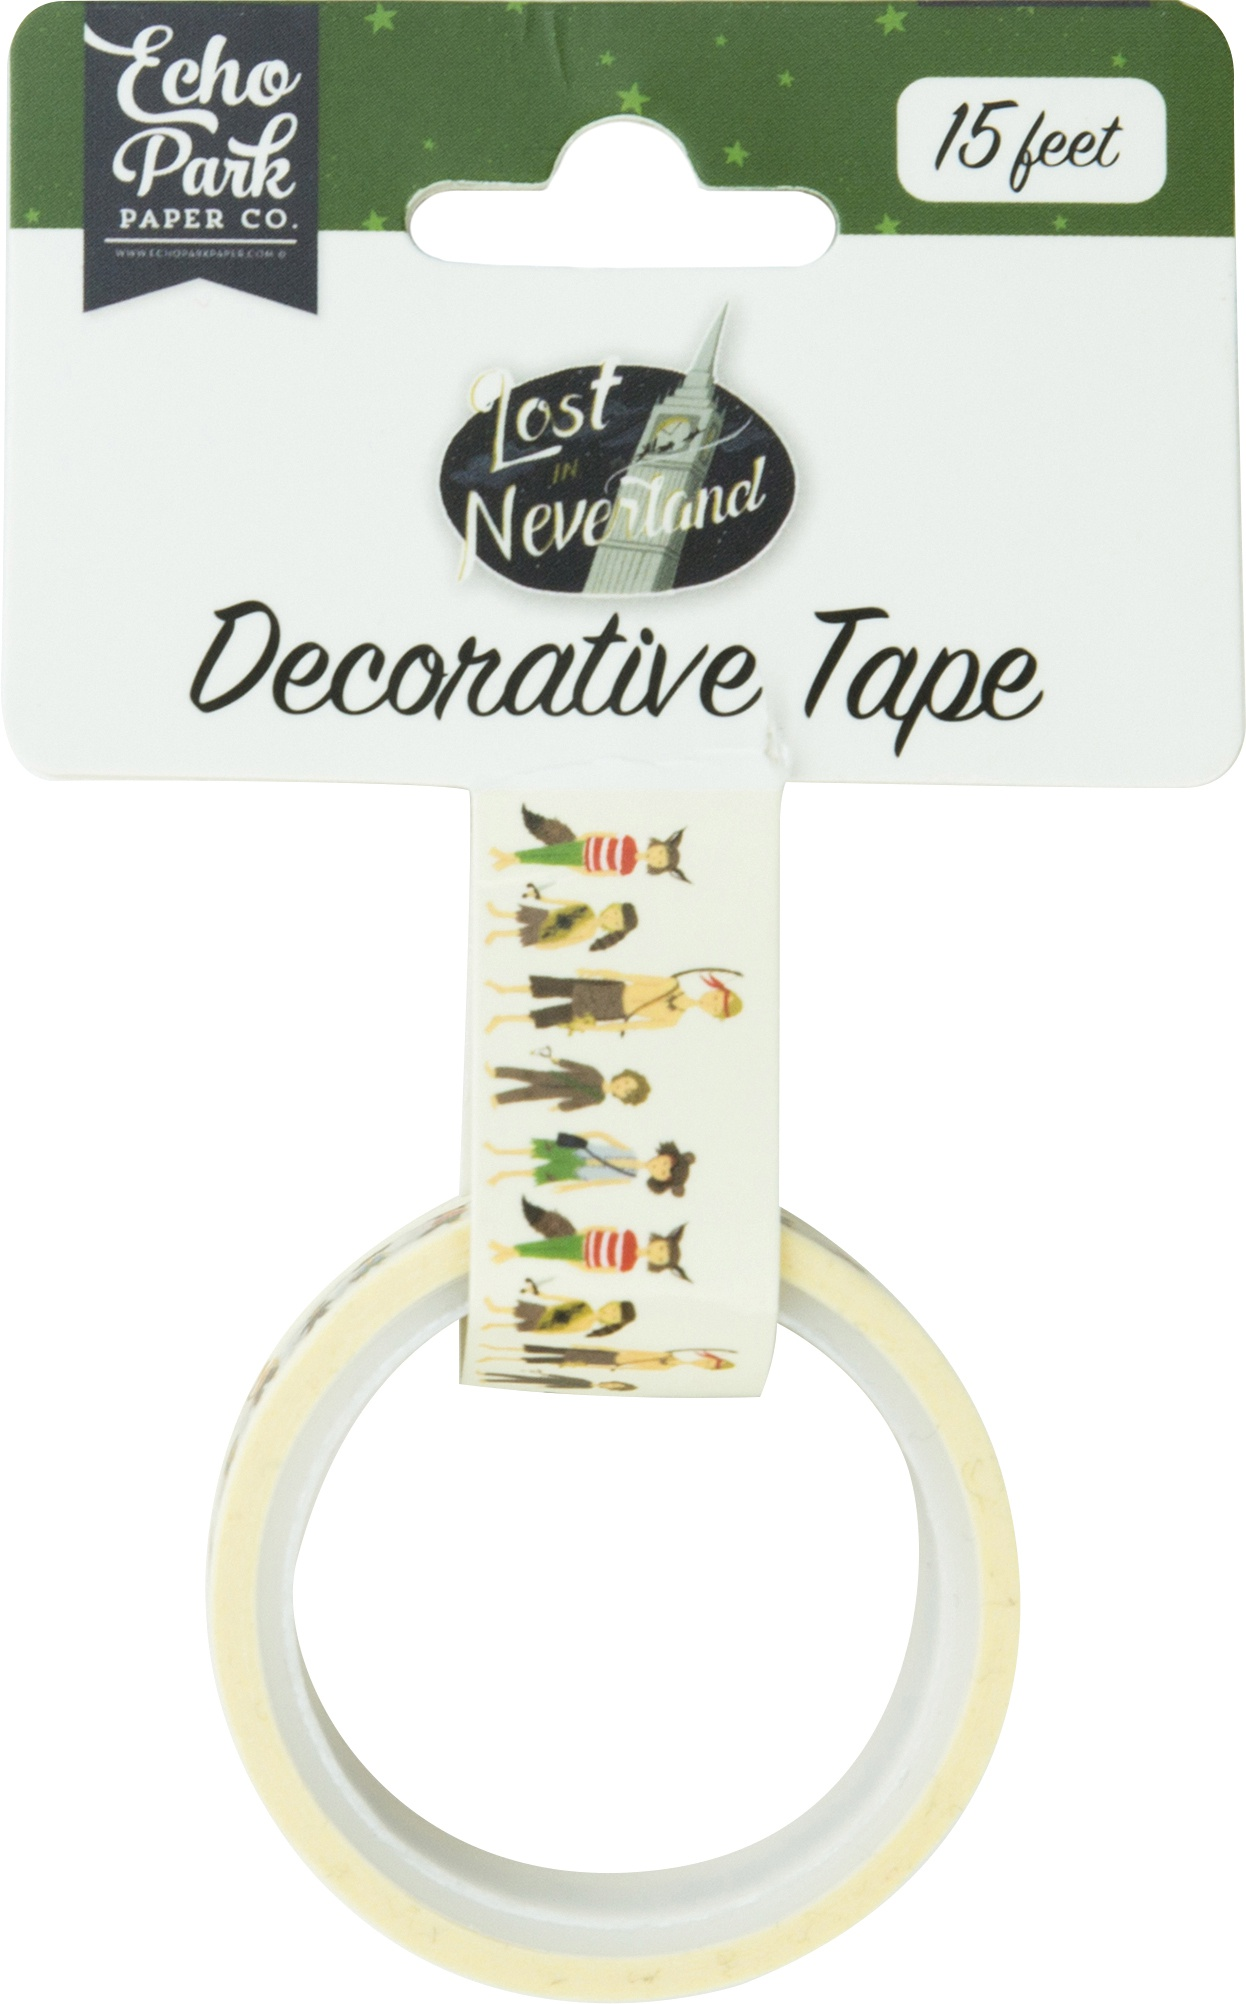 Lost In Neverland Decorative Tape 15'-Lost Boys